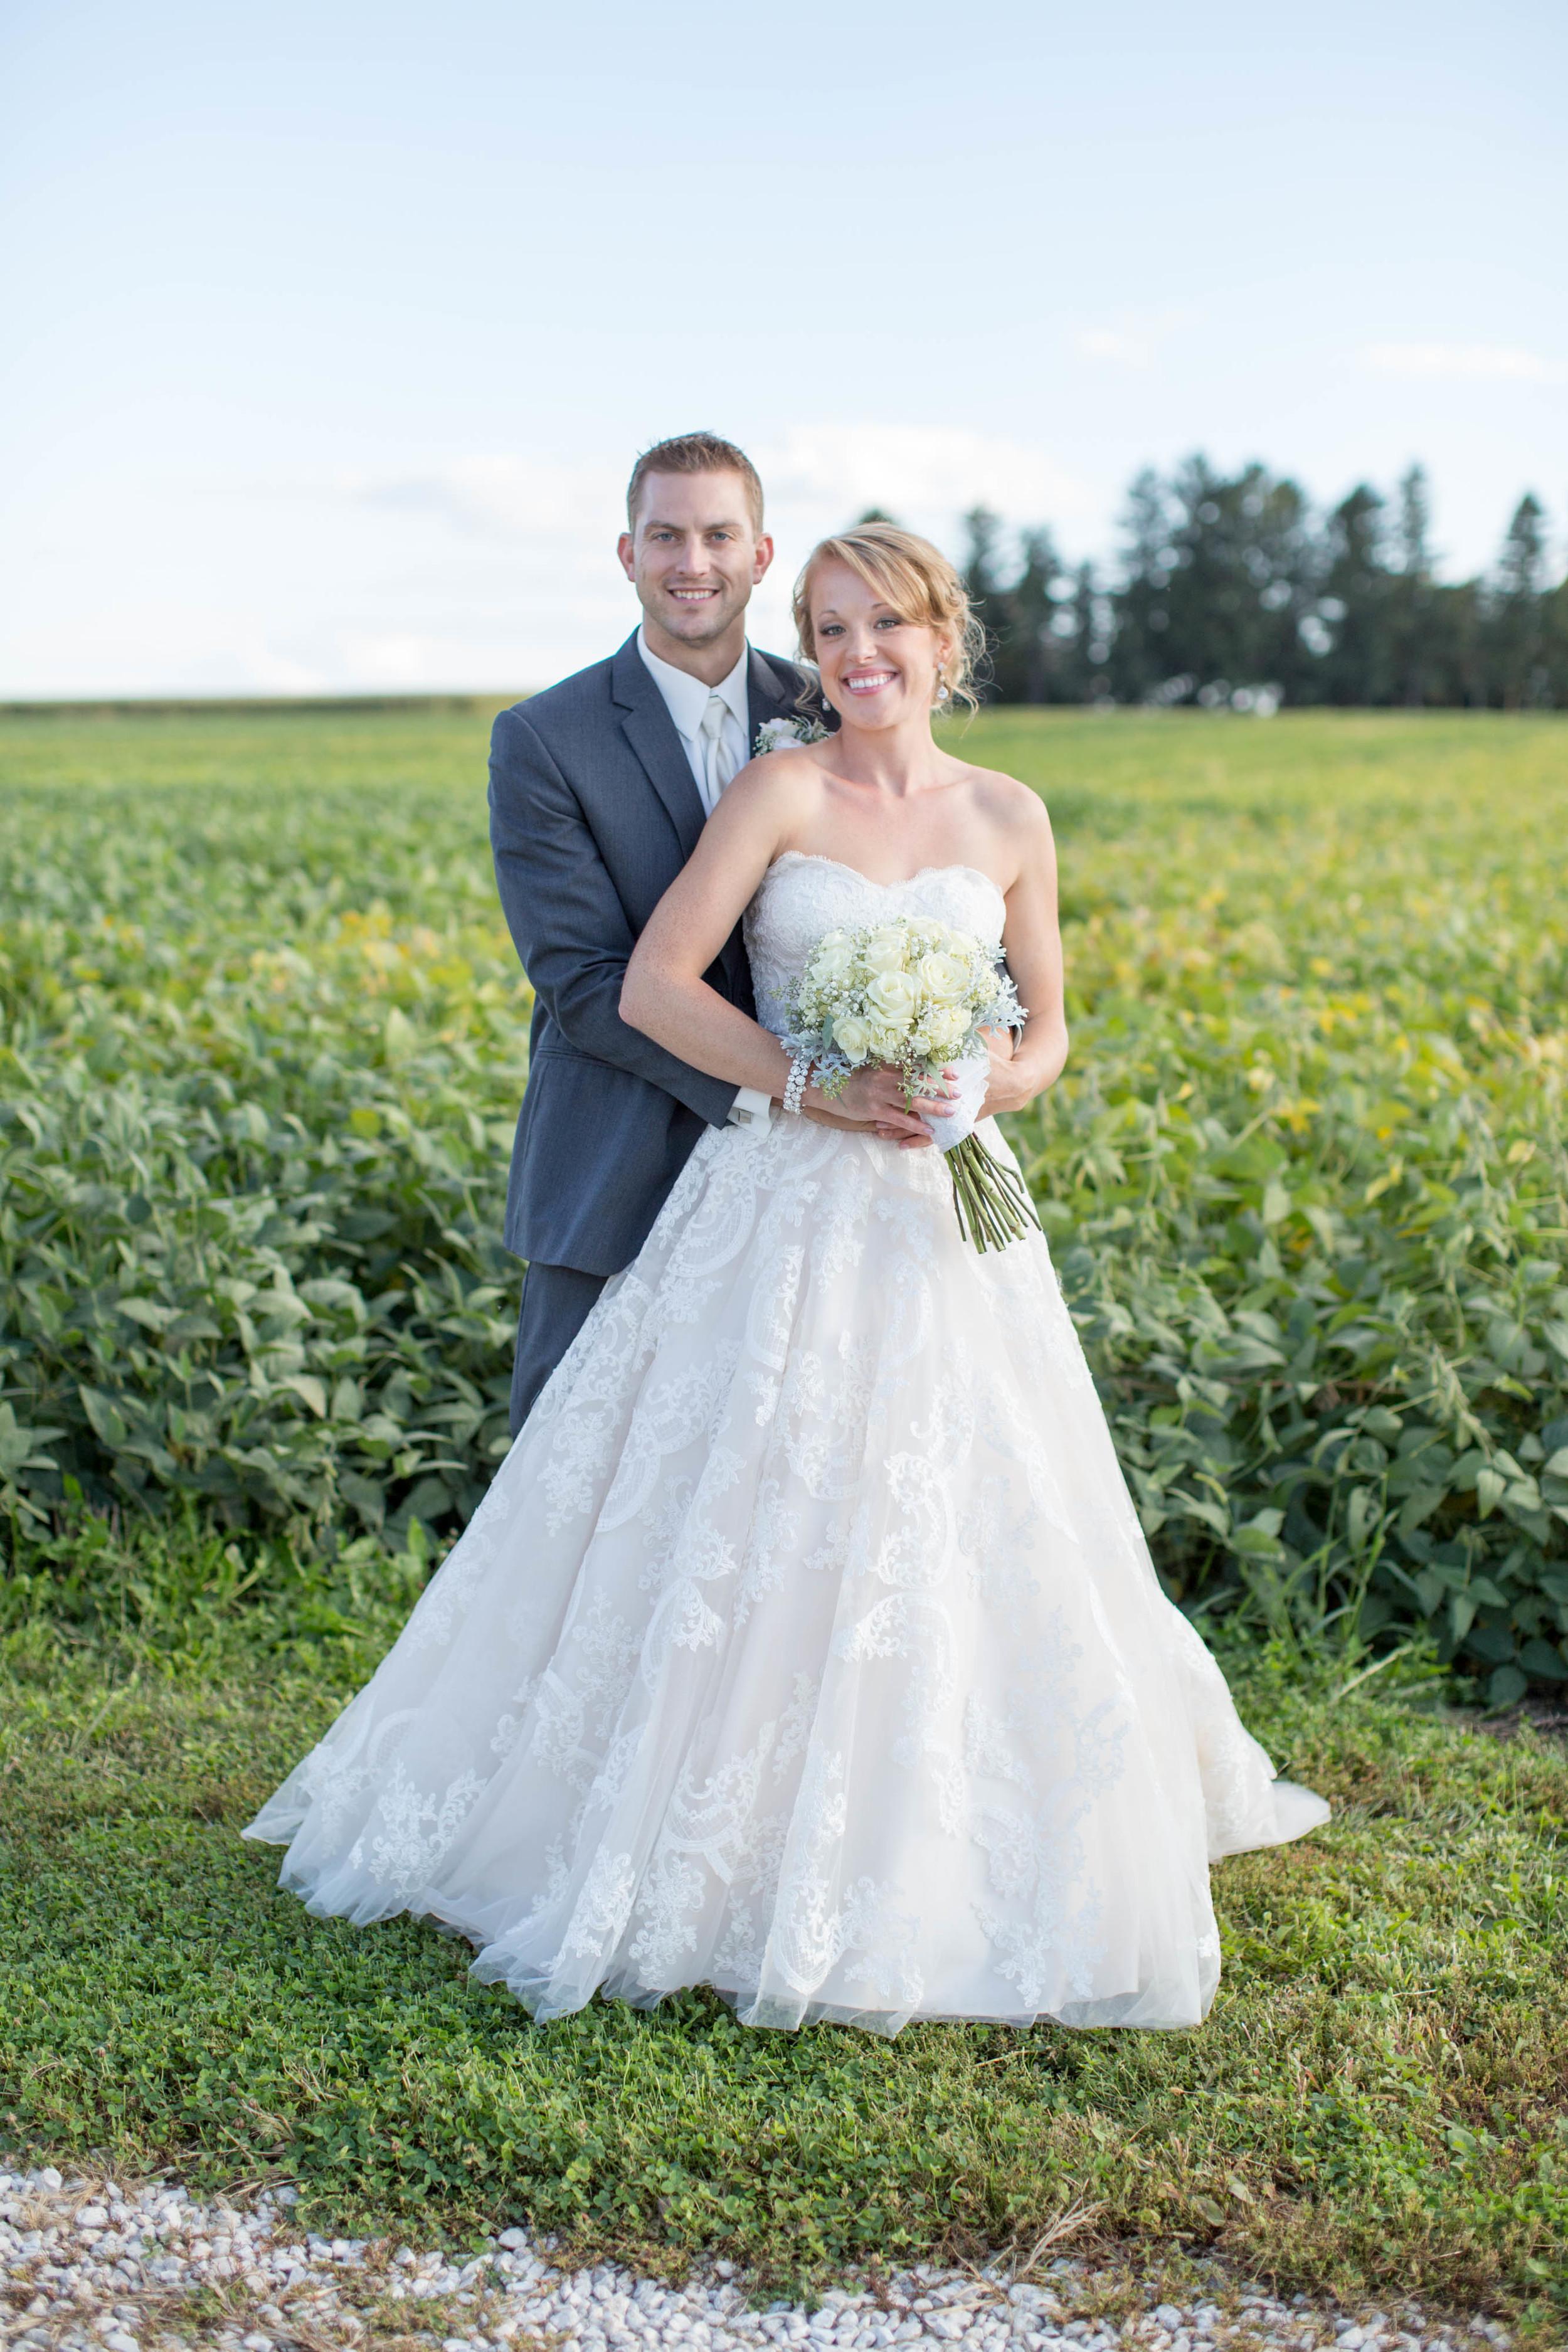 #mnwedding #mnphotographer #countrycharm #brideandgroom